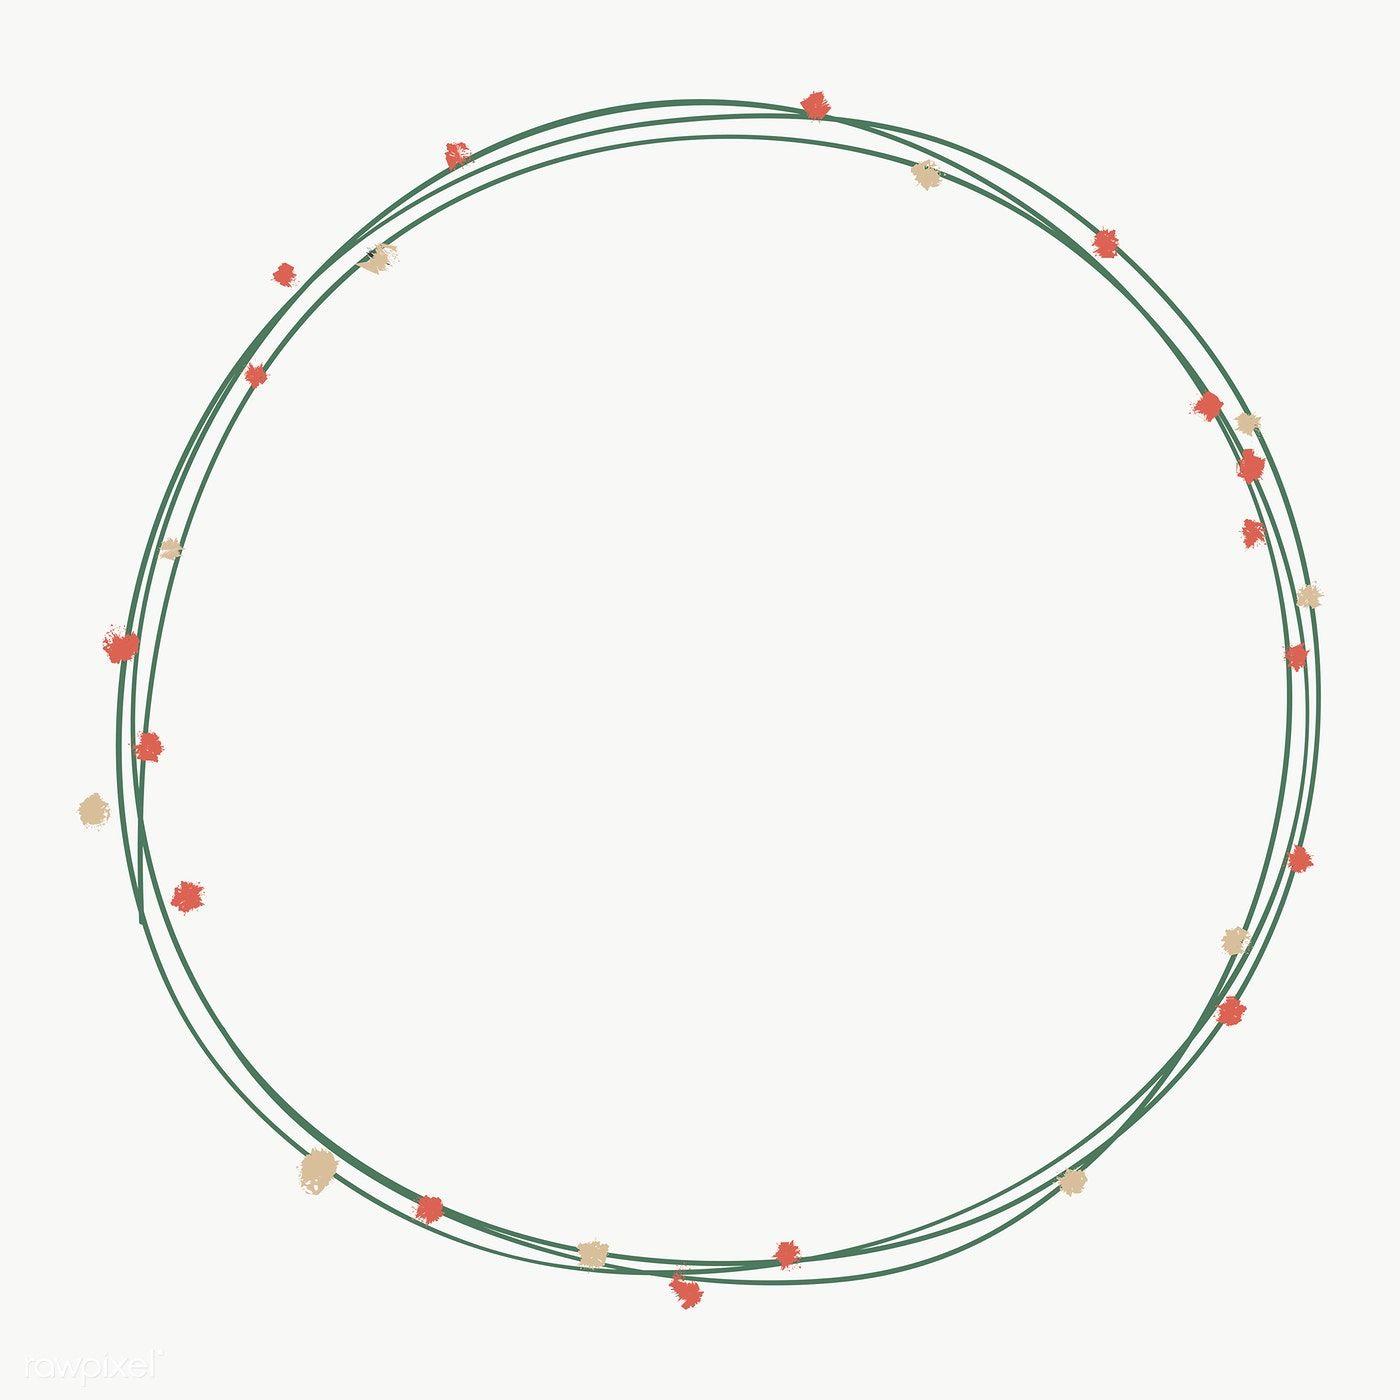 White Circle Frame Png Circle Frames Border Design Circle Borders